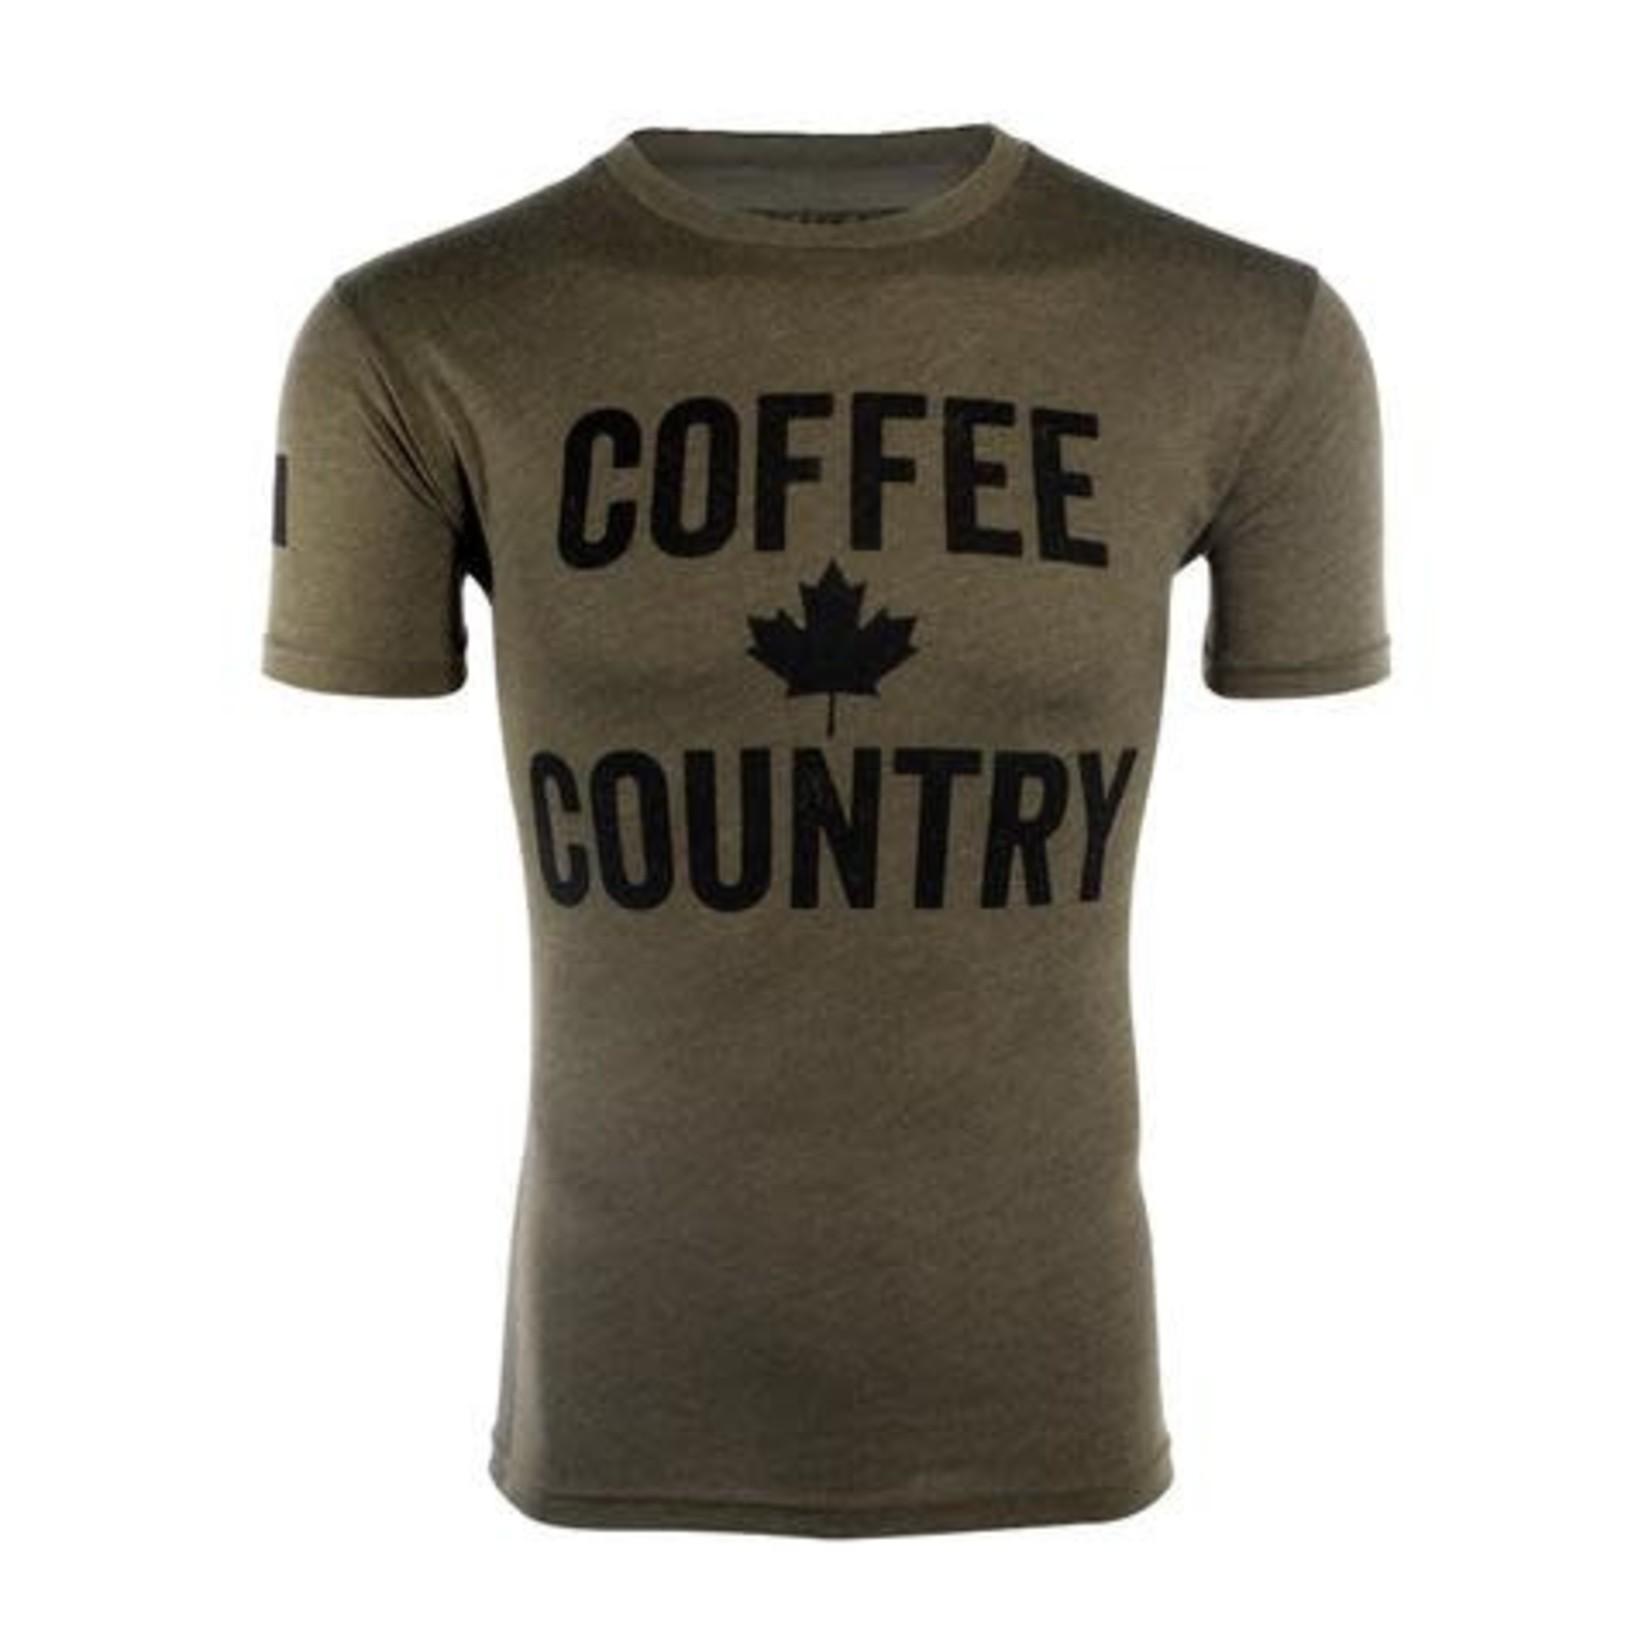 Black Rifle Coffee Black Rifle Coffee Company Shirt-Coffee Country Shirt- Green- Large